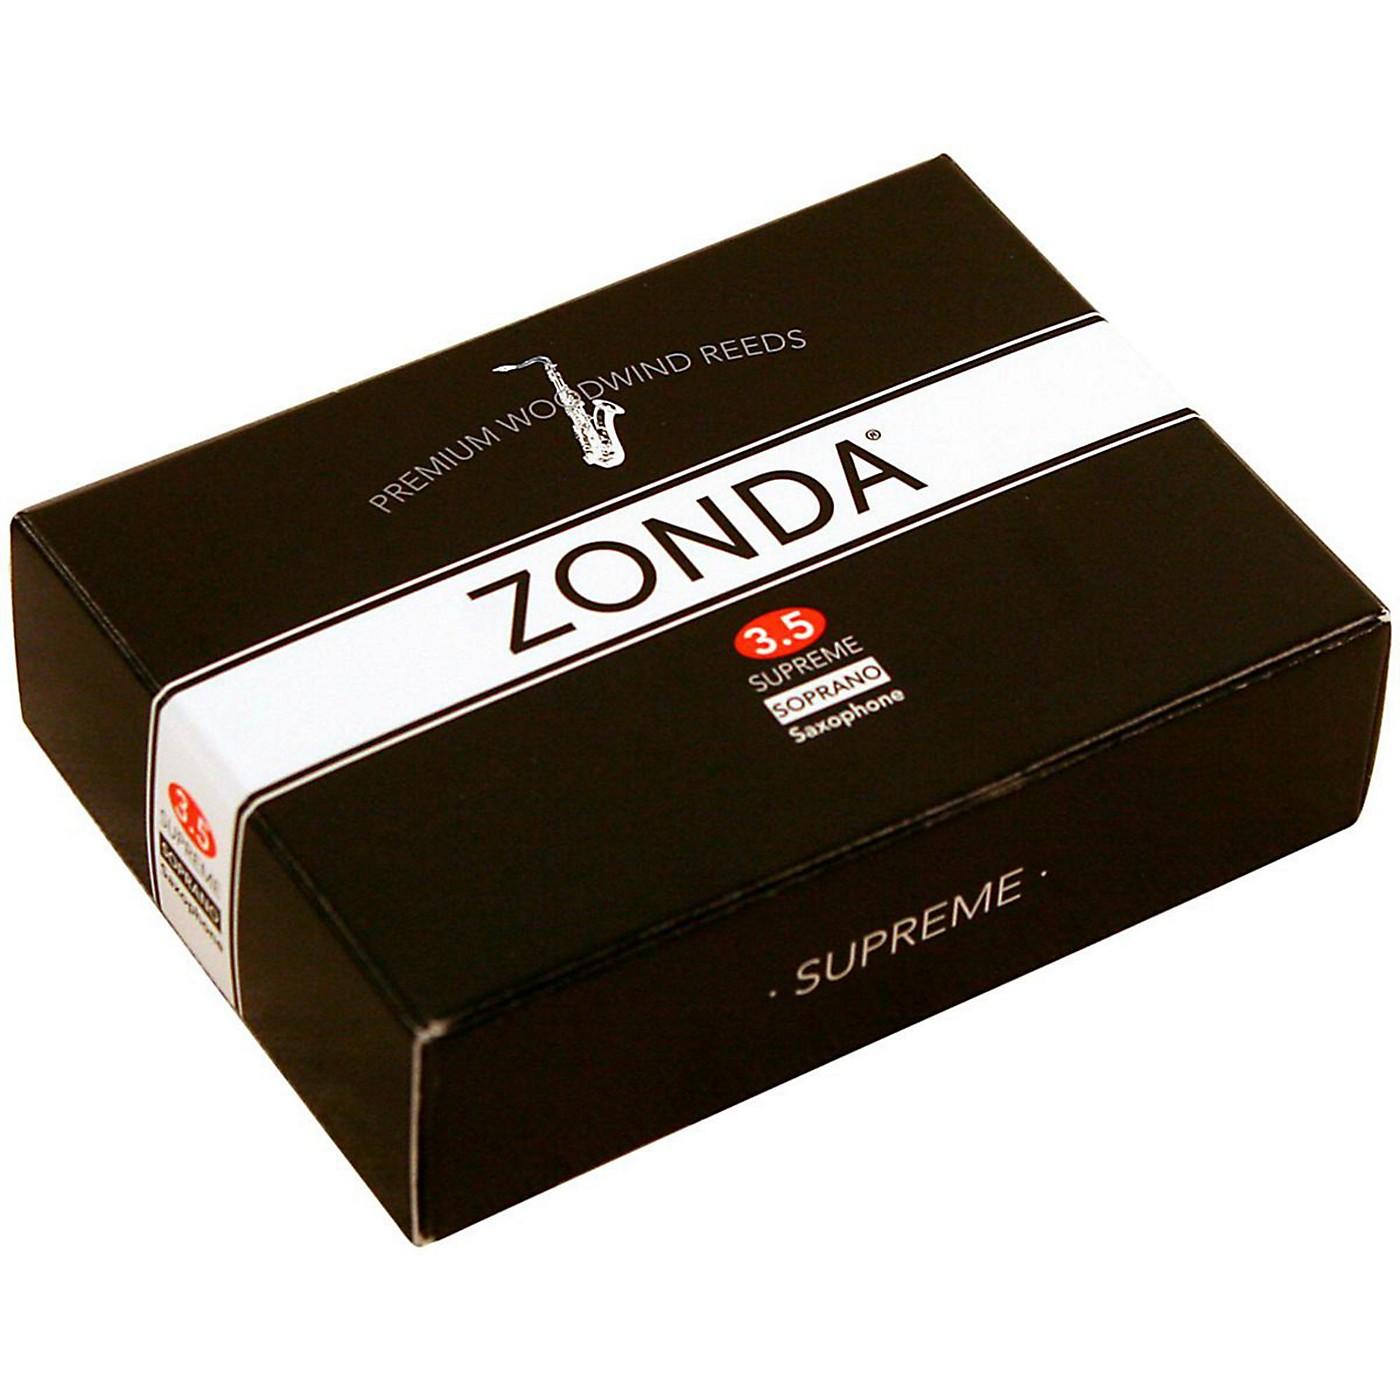 Zonda Supreme Soprano Saxophone Reed thumbnail